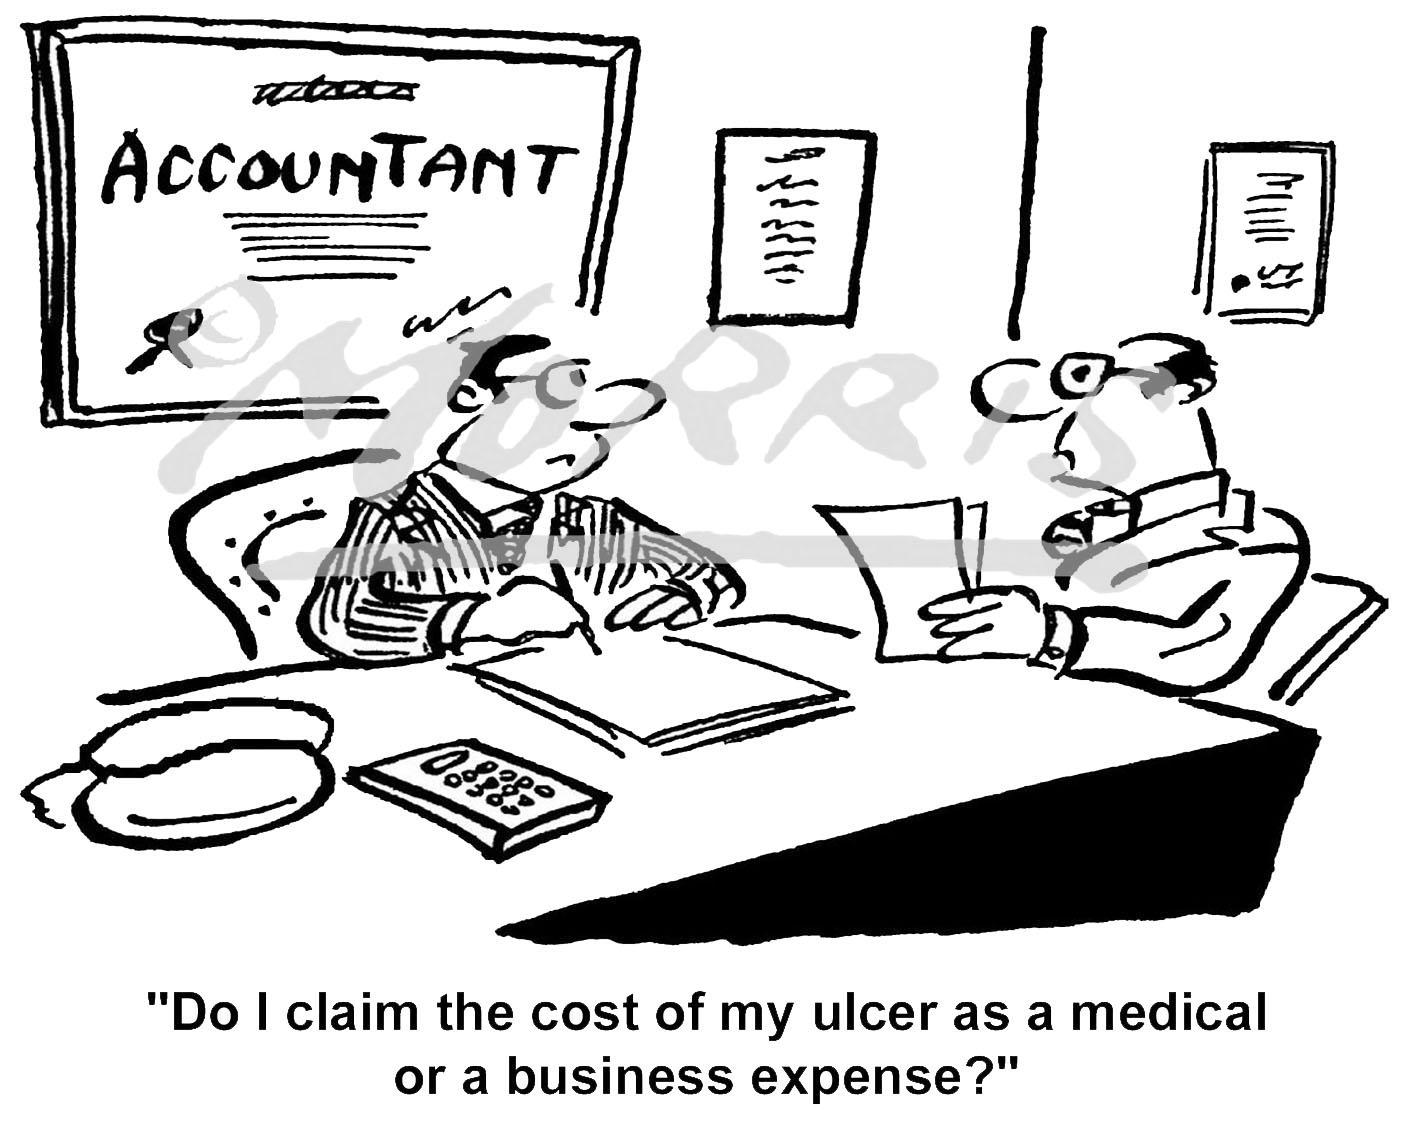 Accountant cartoon, Accountancy cartoon, Accounting cartoon, Auditor cartoon – Ref: 1282bw